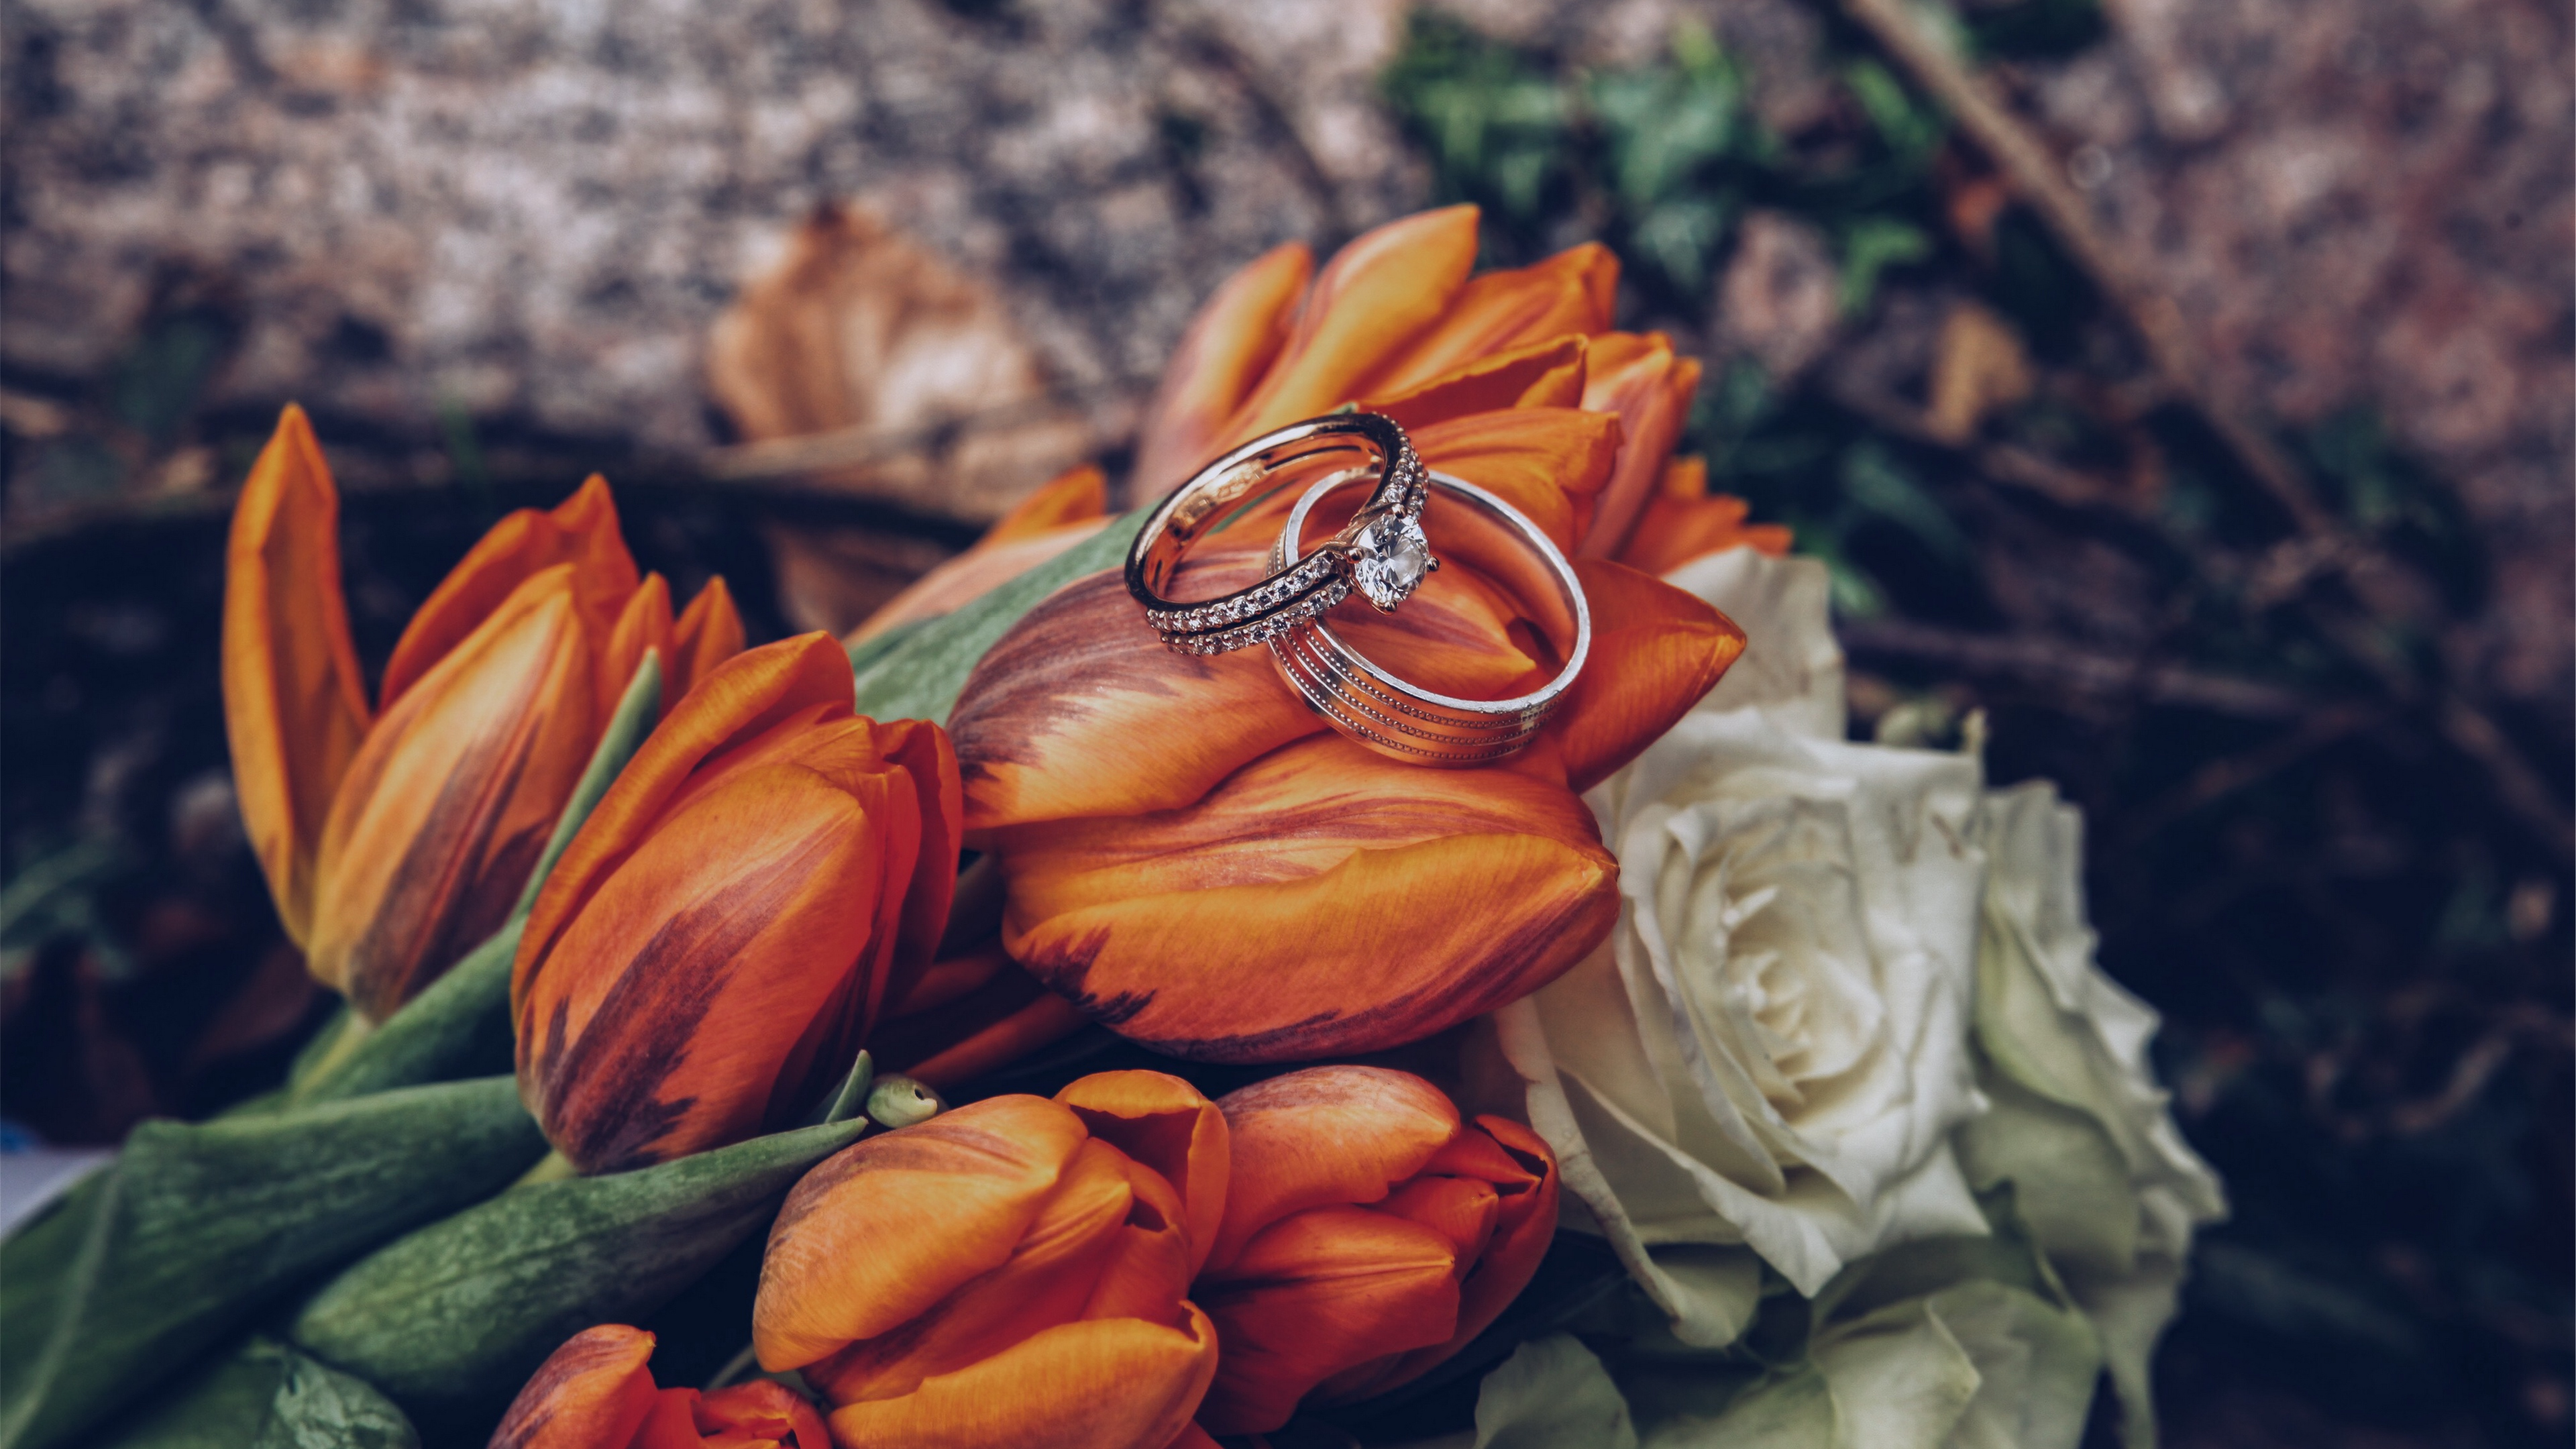 tulips rings flowers romance wedding 4k 1538344840 - tulips, rings, flowers, romance, wedding 4k - Tulips, Rings, Flowers